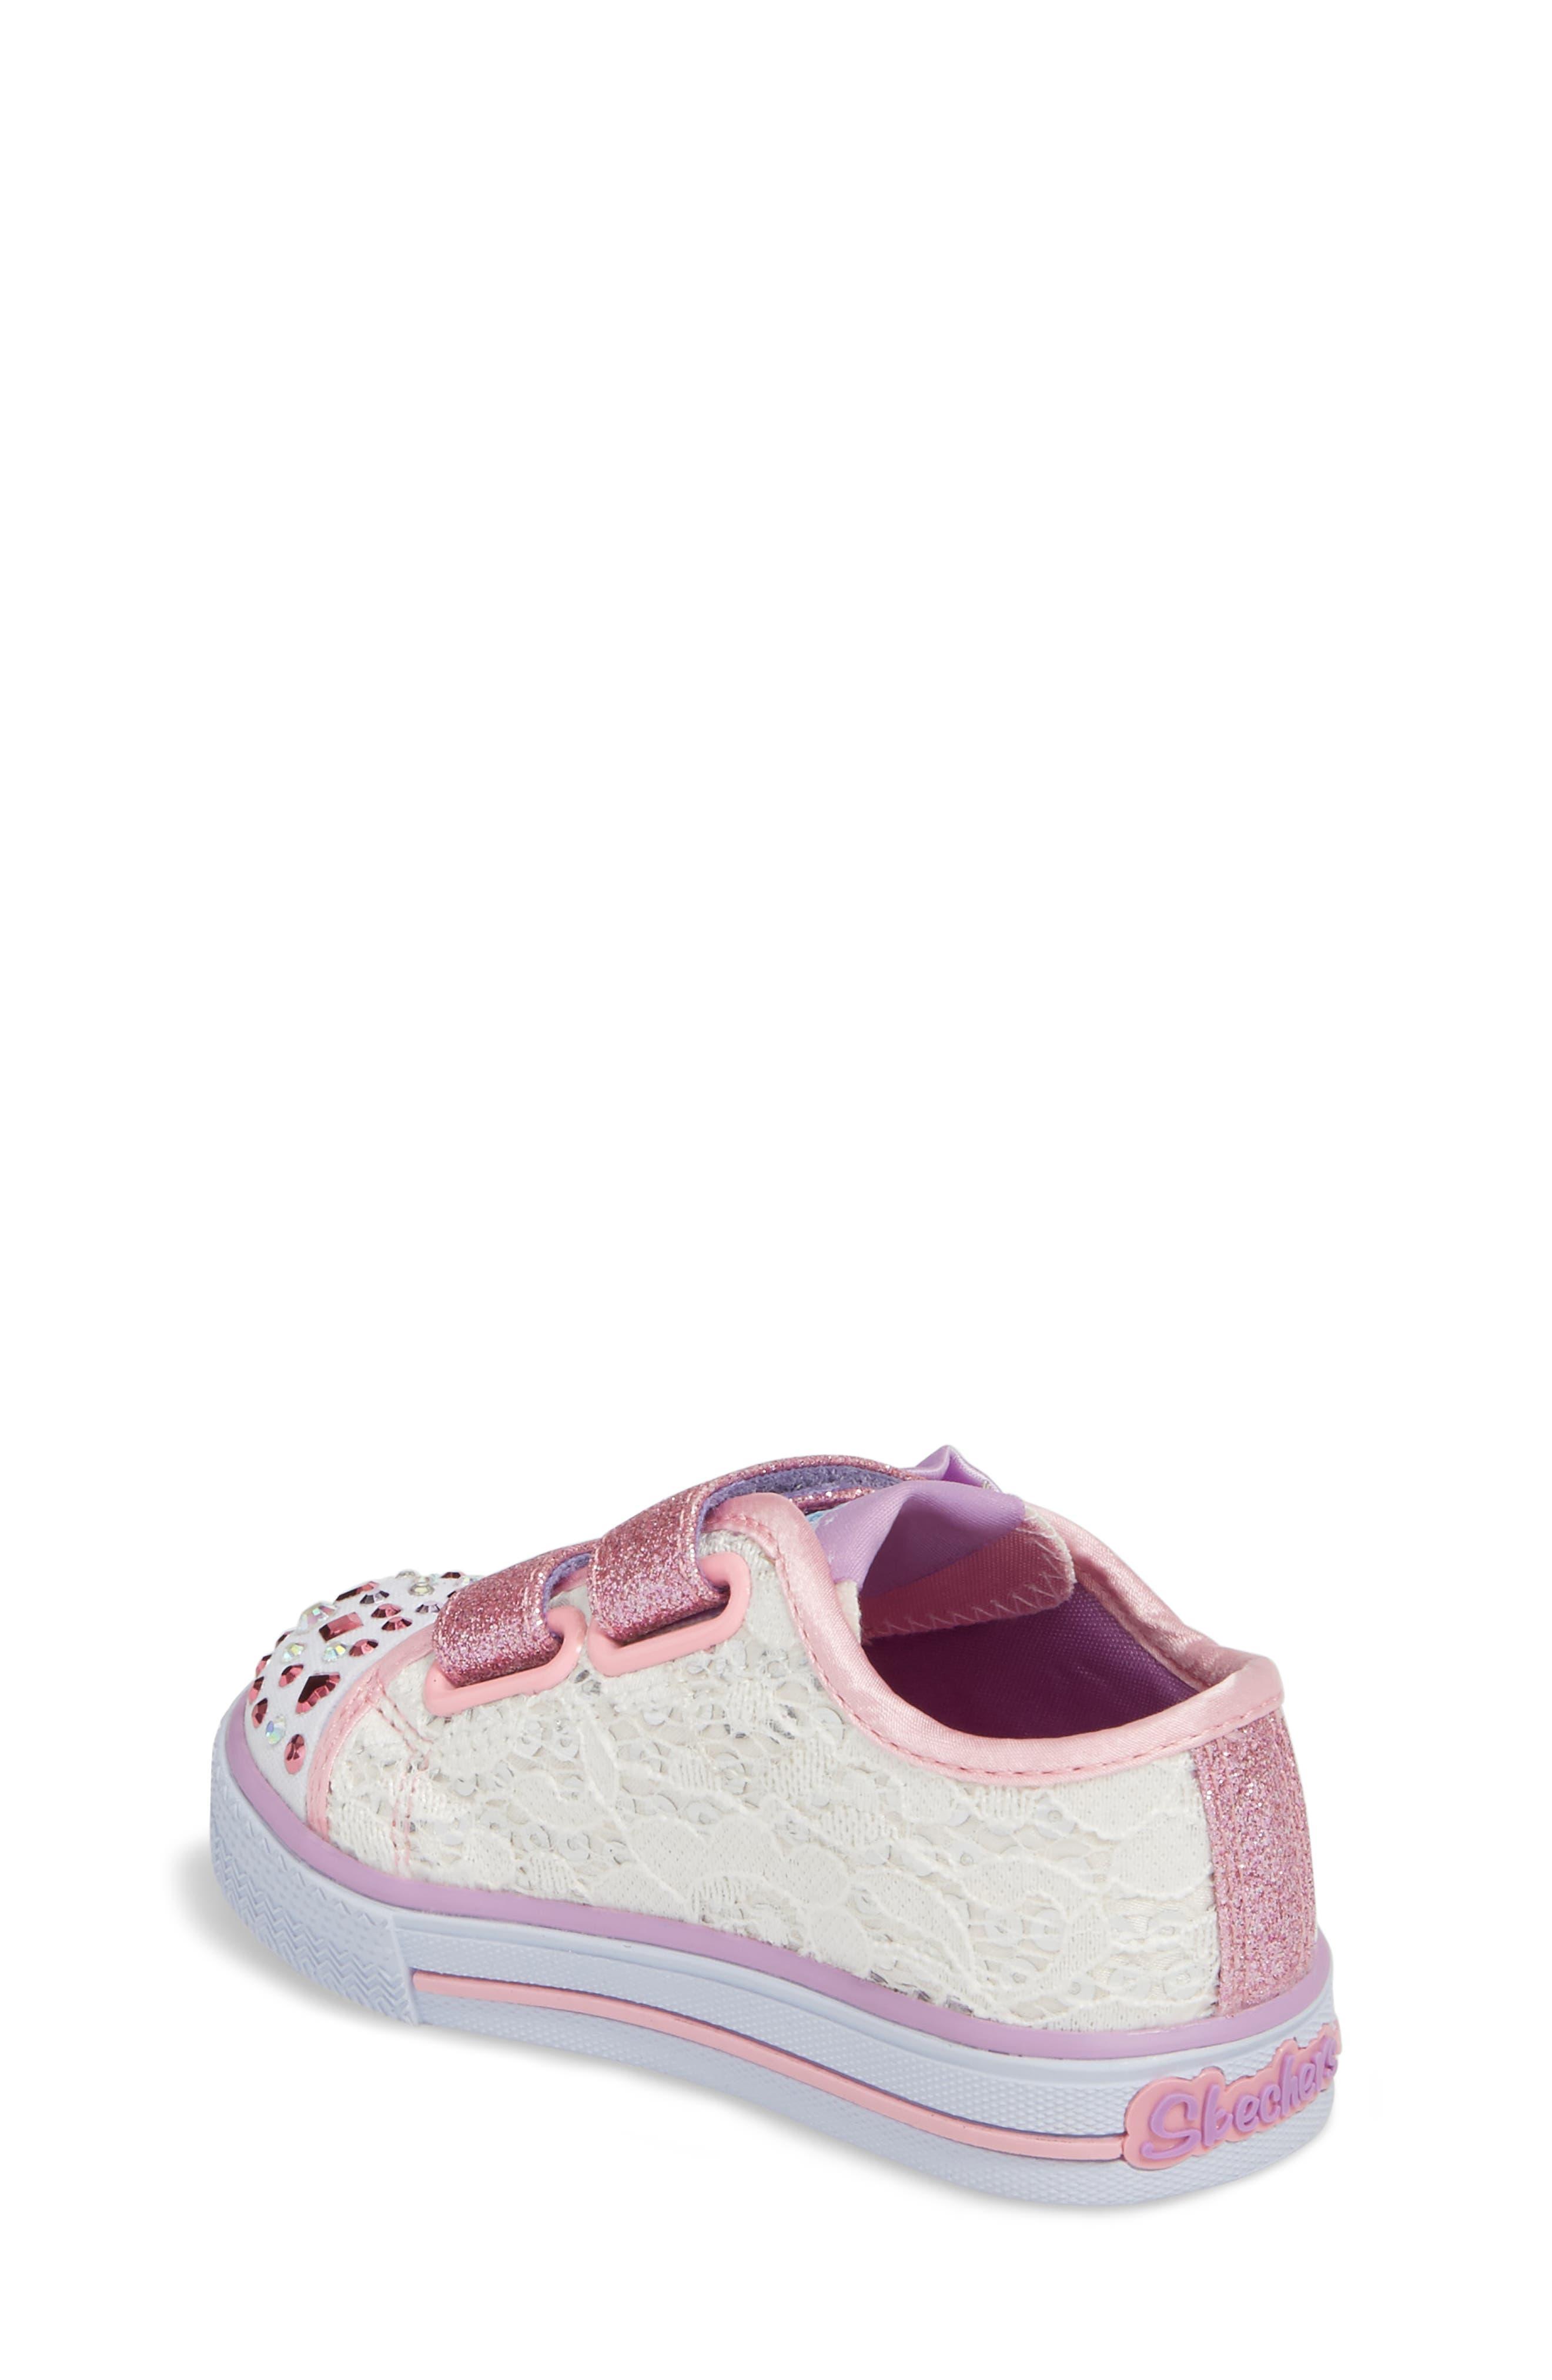 Twinkle Toes Shuffles Light-Up Glitter Sneaker,                             Alternate thumbnail 2, color,                             White/ Silver/ Light Pink